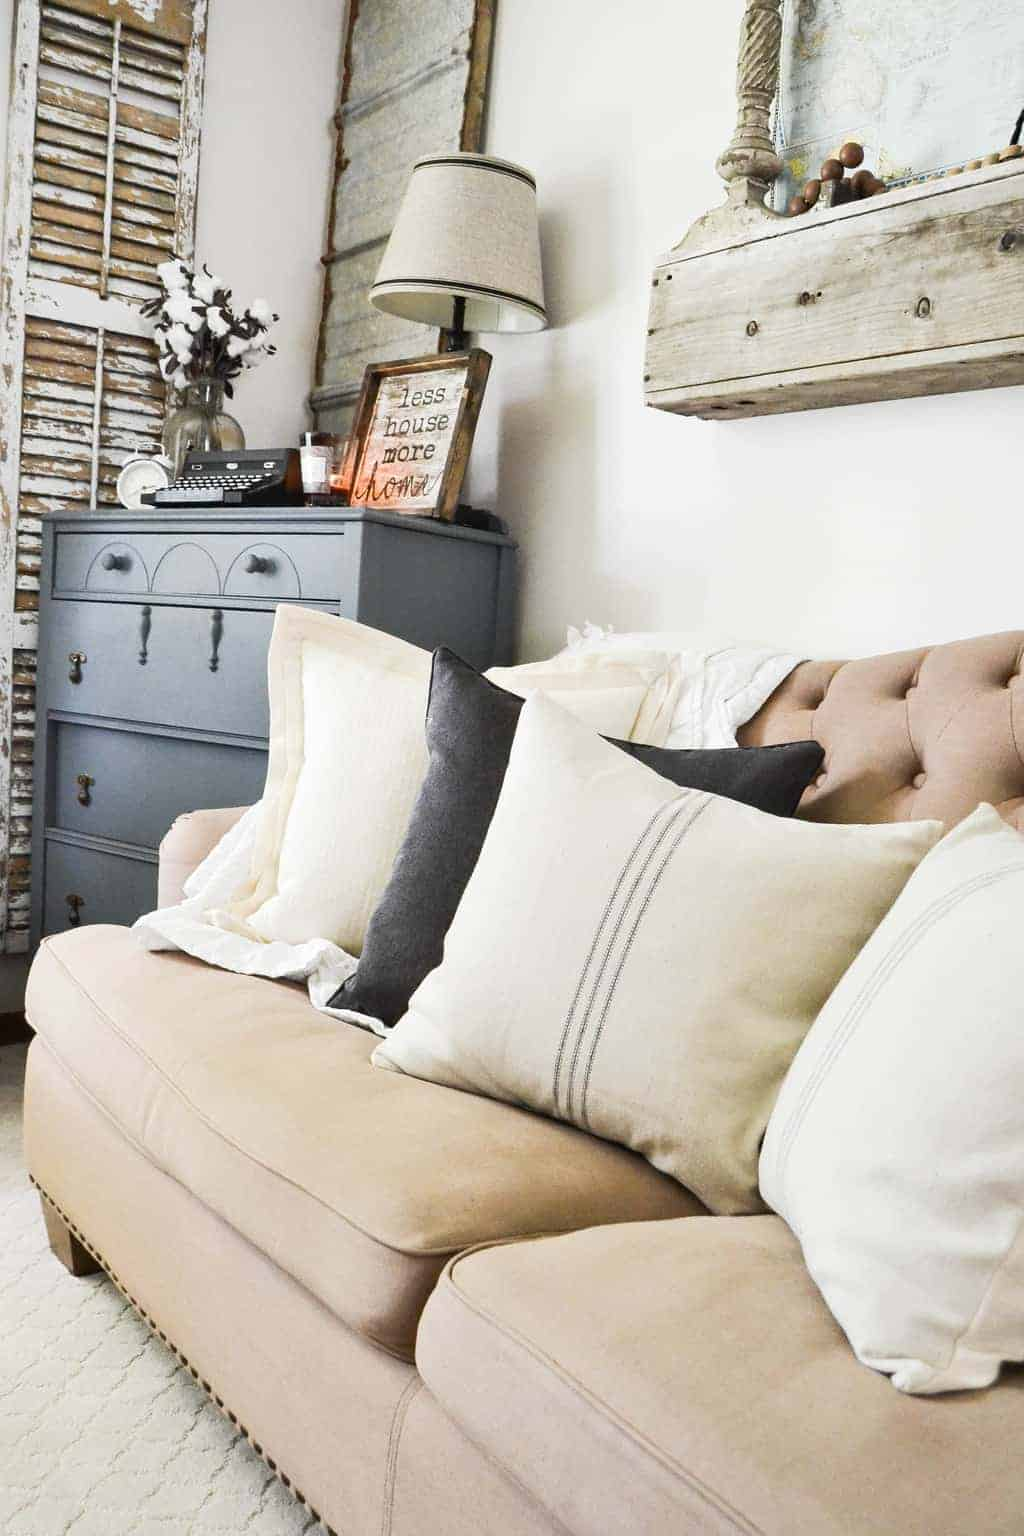 Farmhouse Throw Pillows With Grain Sack Stripes - My Creative Days